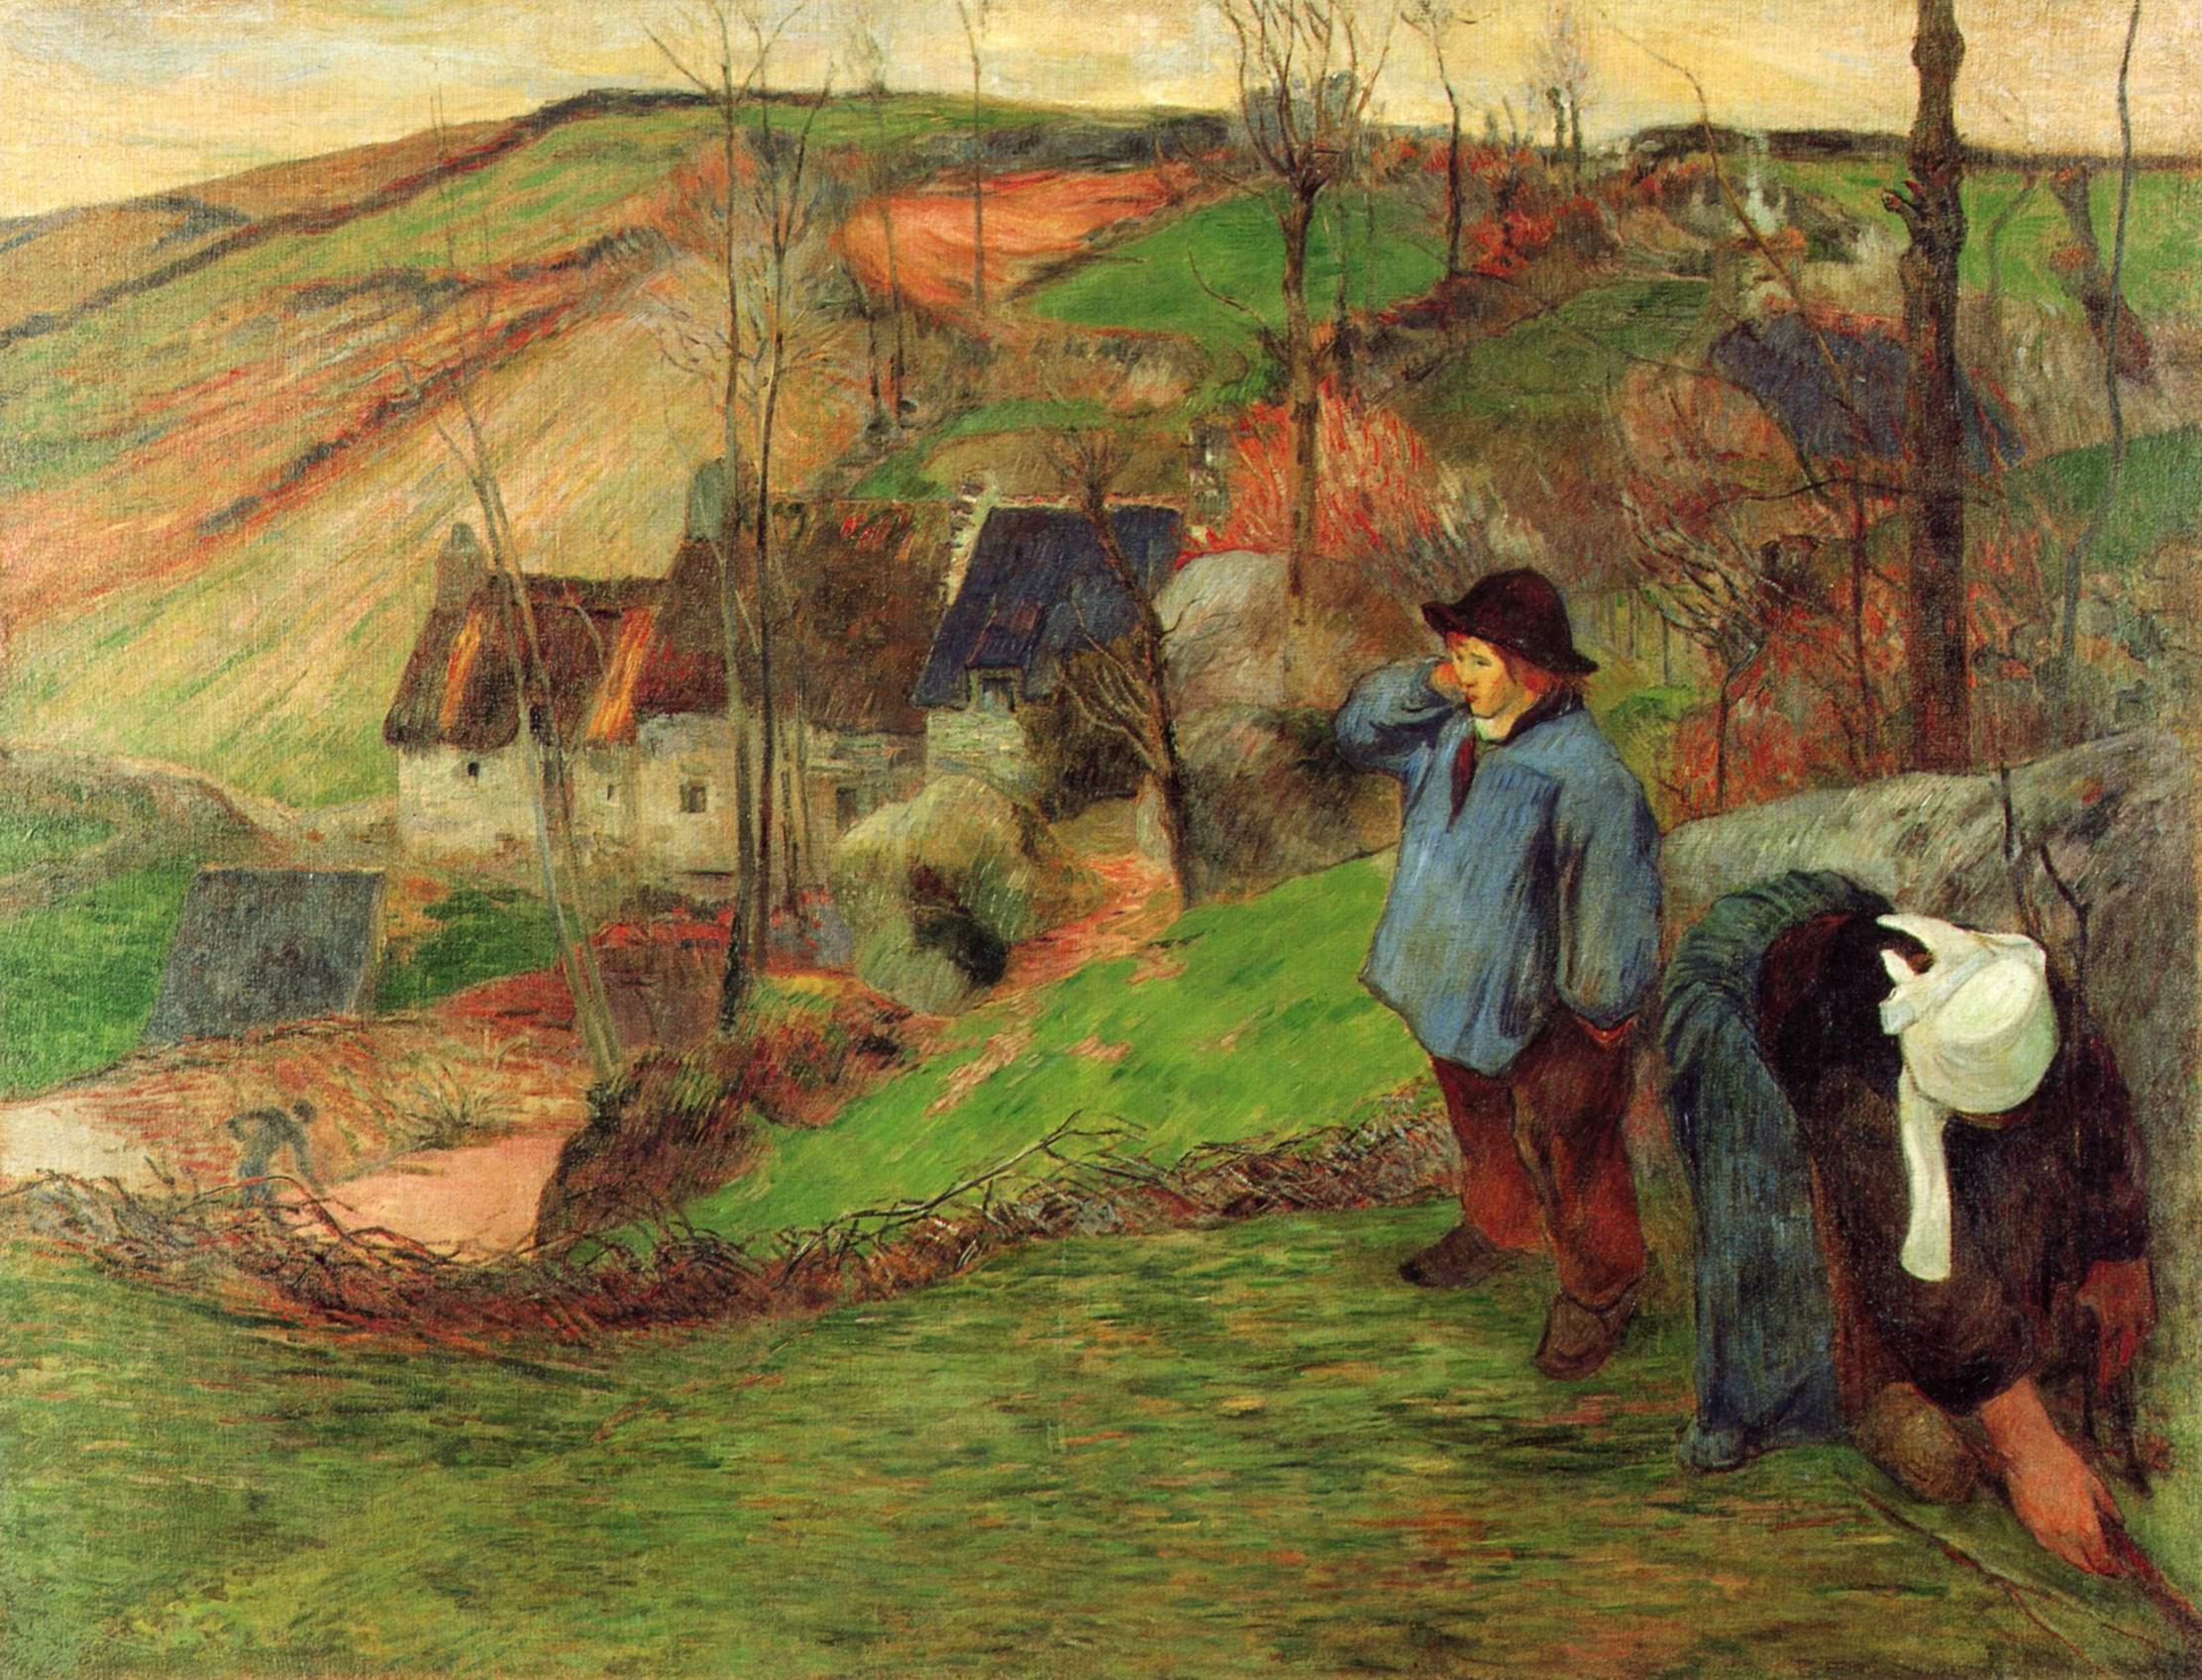 Бретонский пастух, Поль Гоген